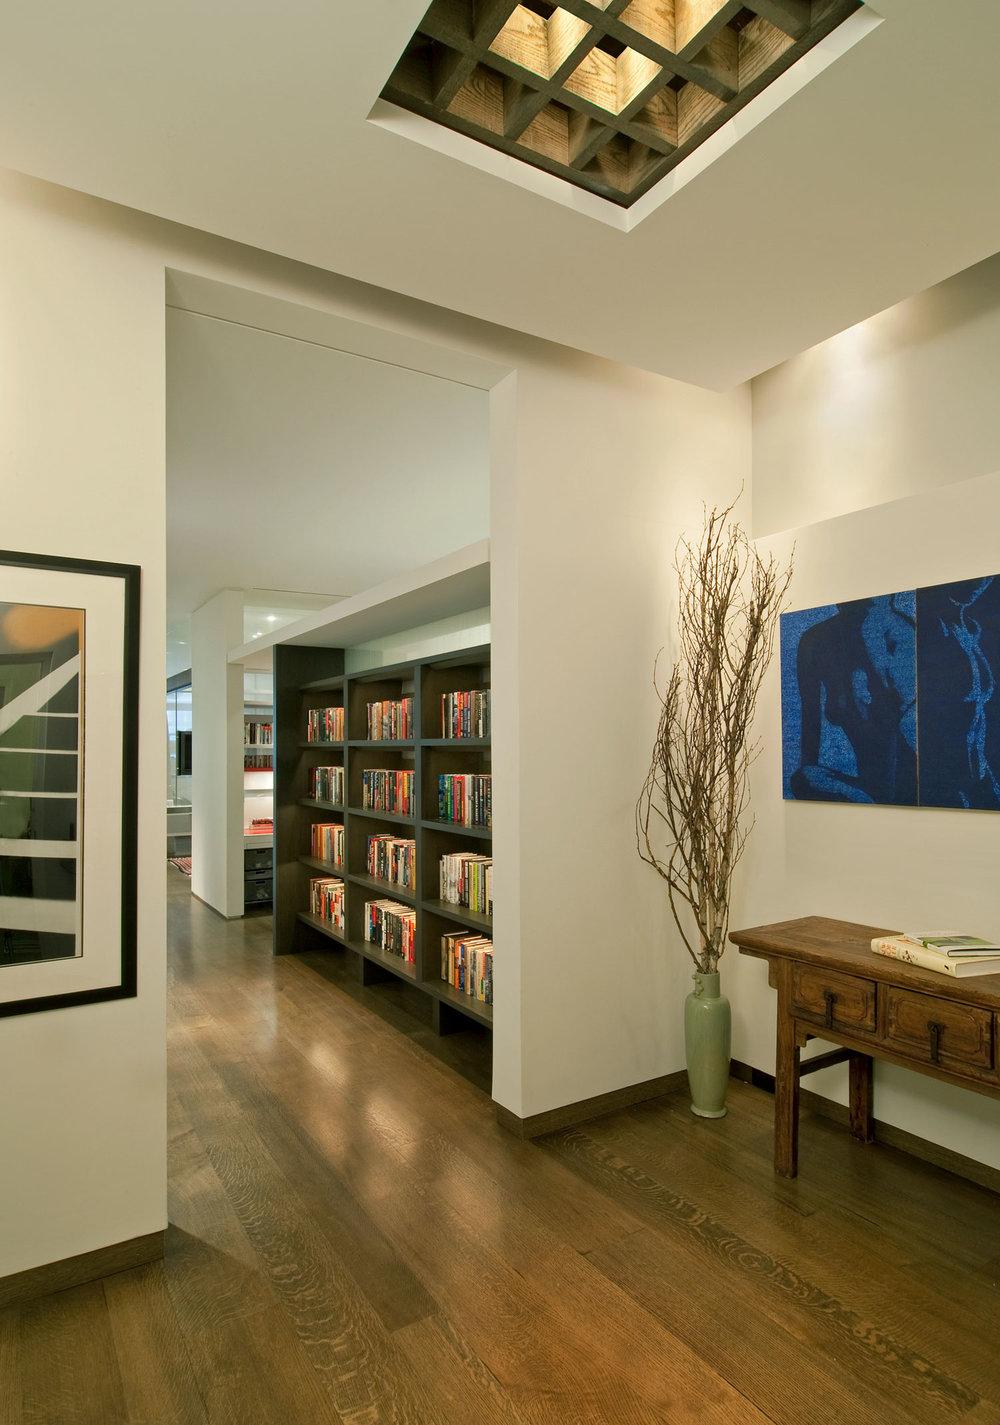 NYC Loft Renovation - Entrance foyer and bookshelf system